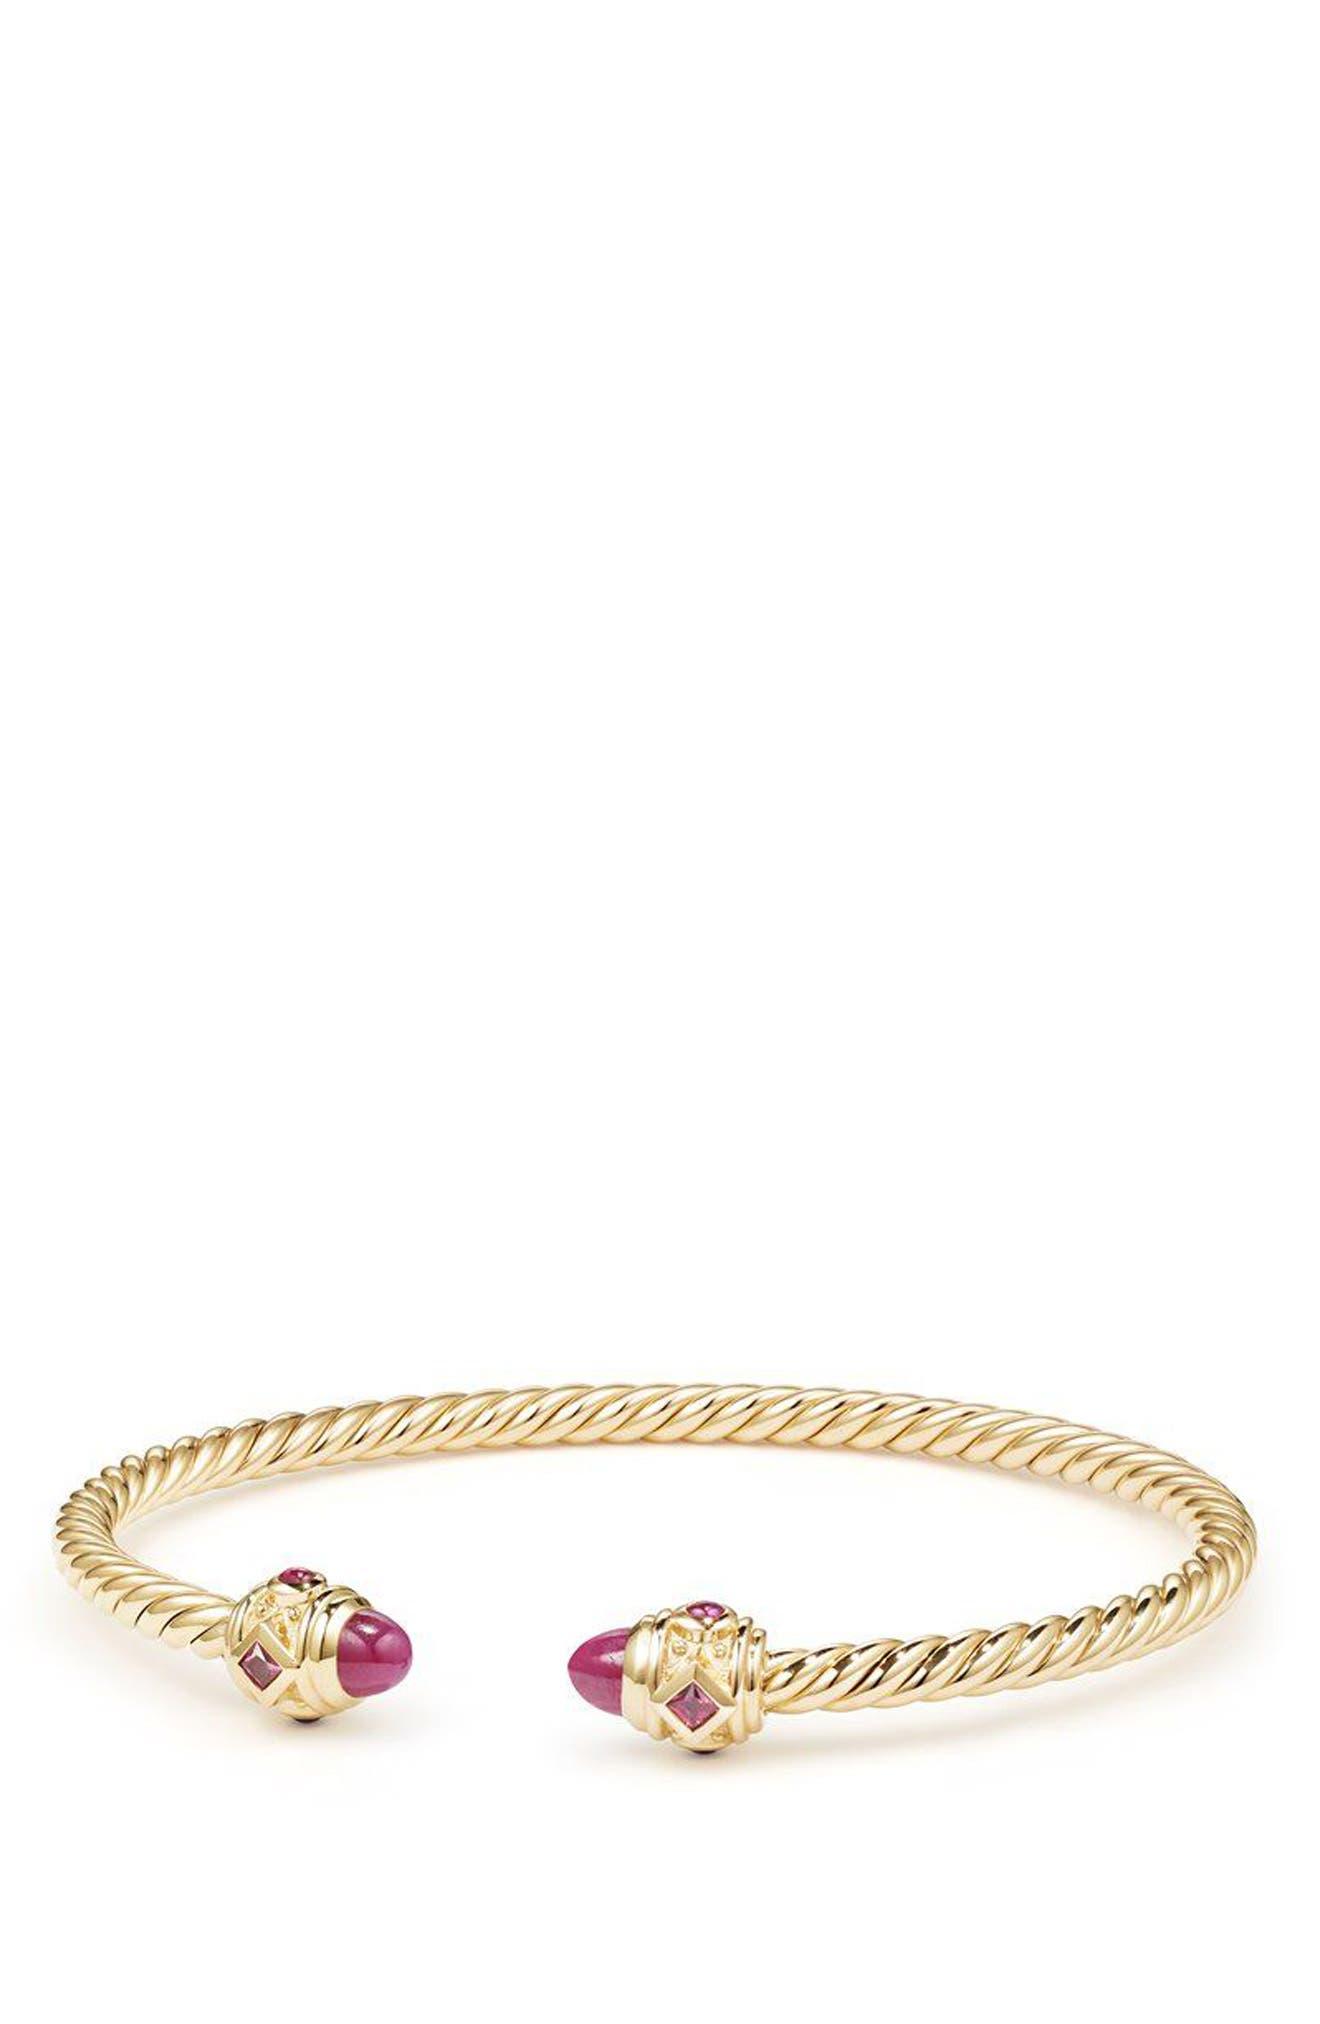 Renaissance Bracelet in 18K Gold, 3.5mm,                         Main,                         color, Gold/ Ruby